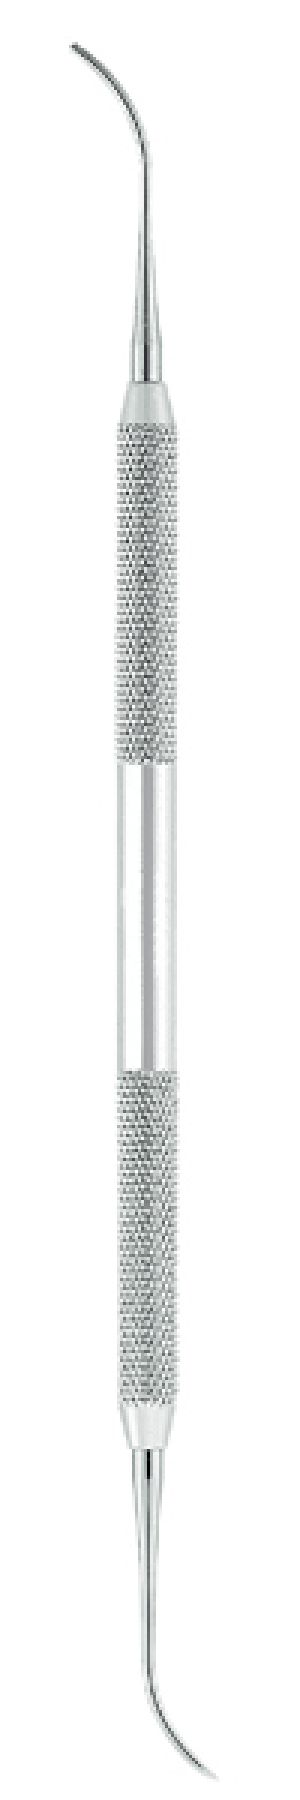 MI-73-101 Dental Wax & Modelling Carver